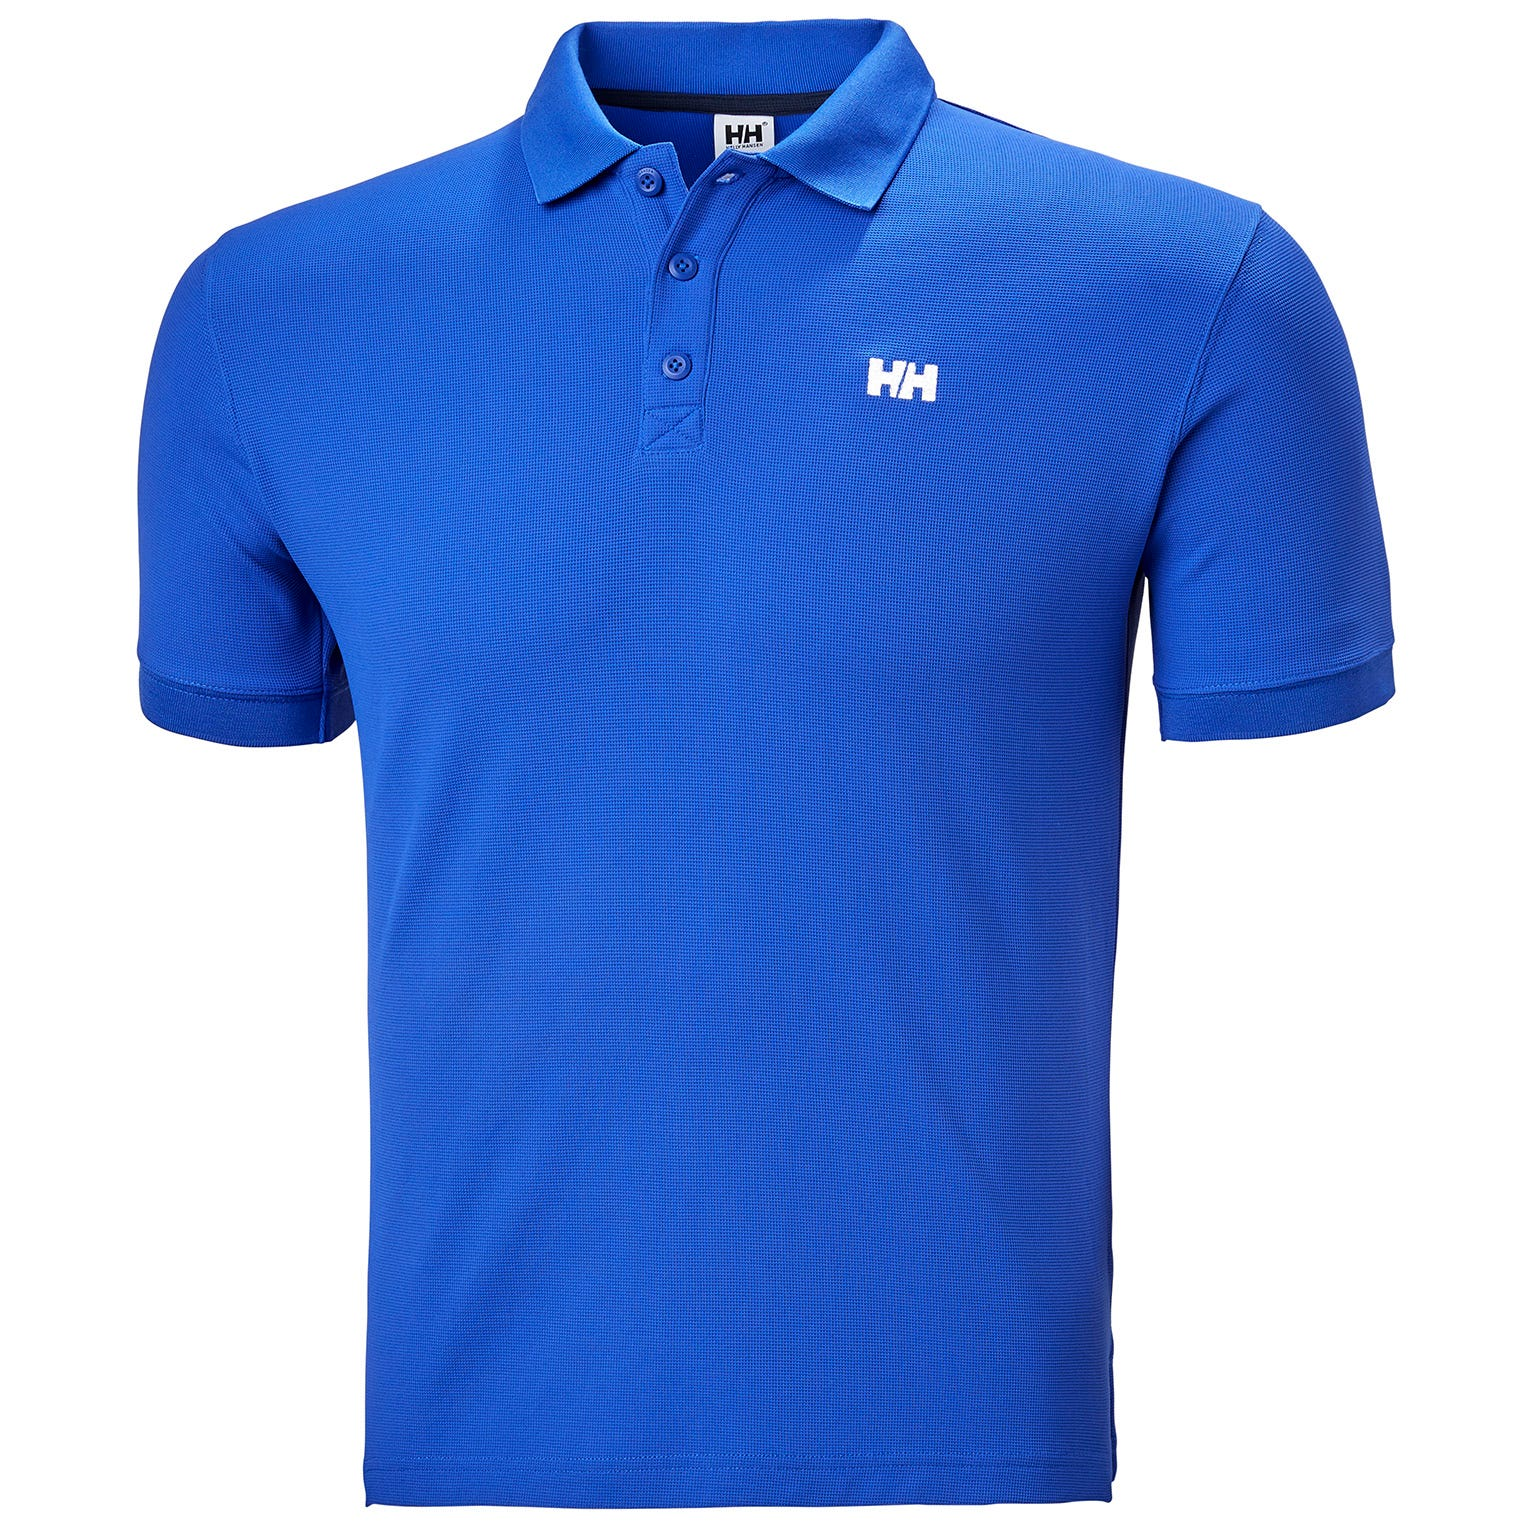 Driftline Polo | Performance Short Sleeve Shirt Gb Helly Hansen Mens Wicking Blue M